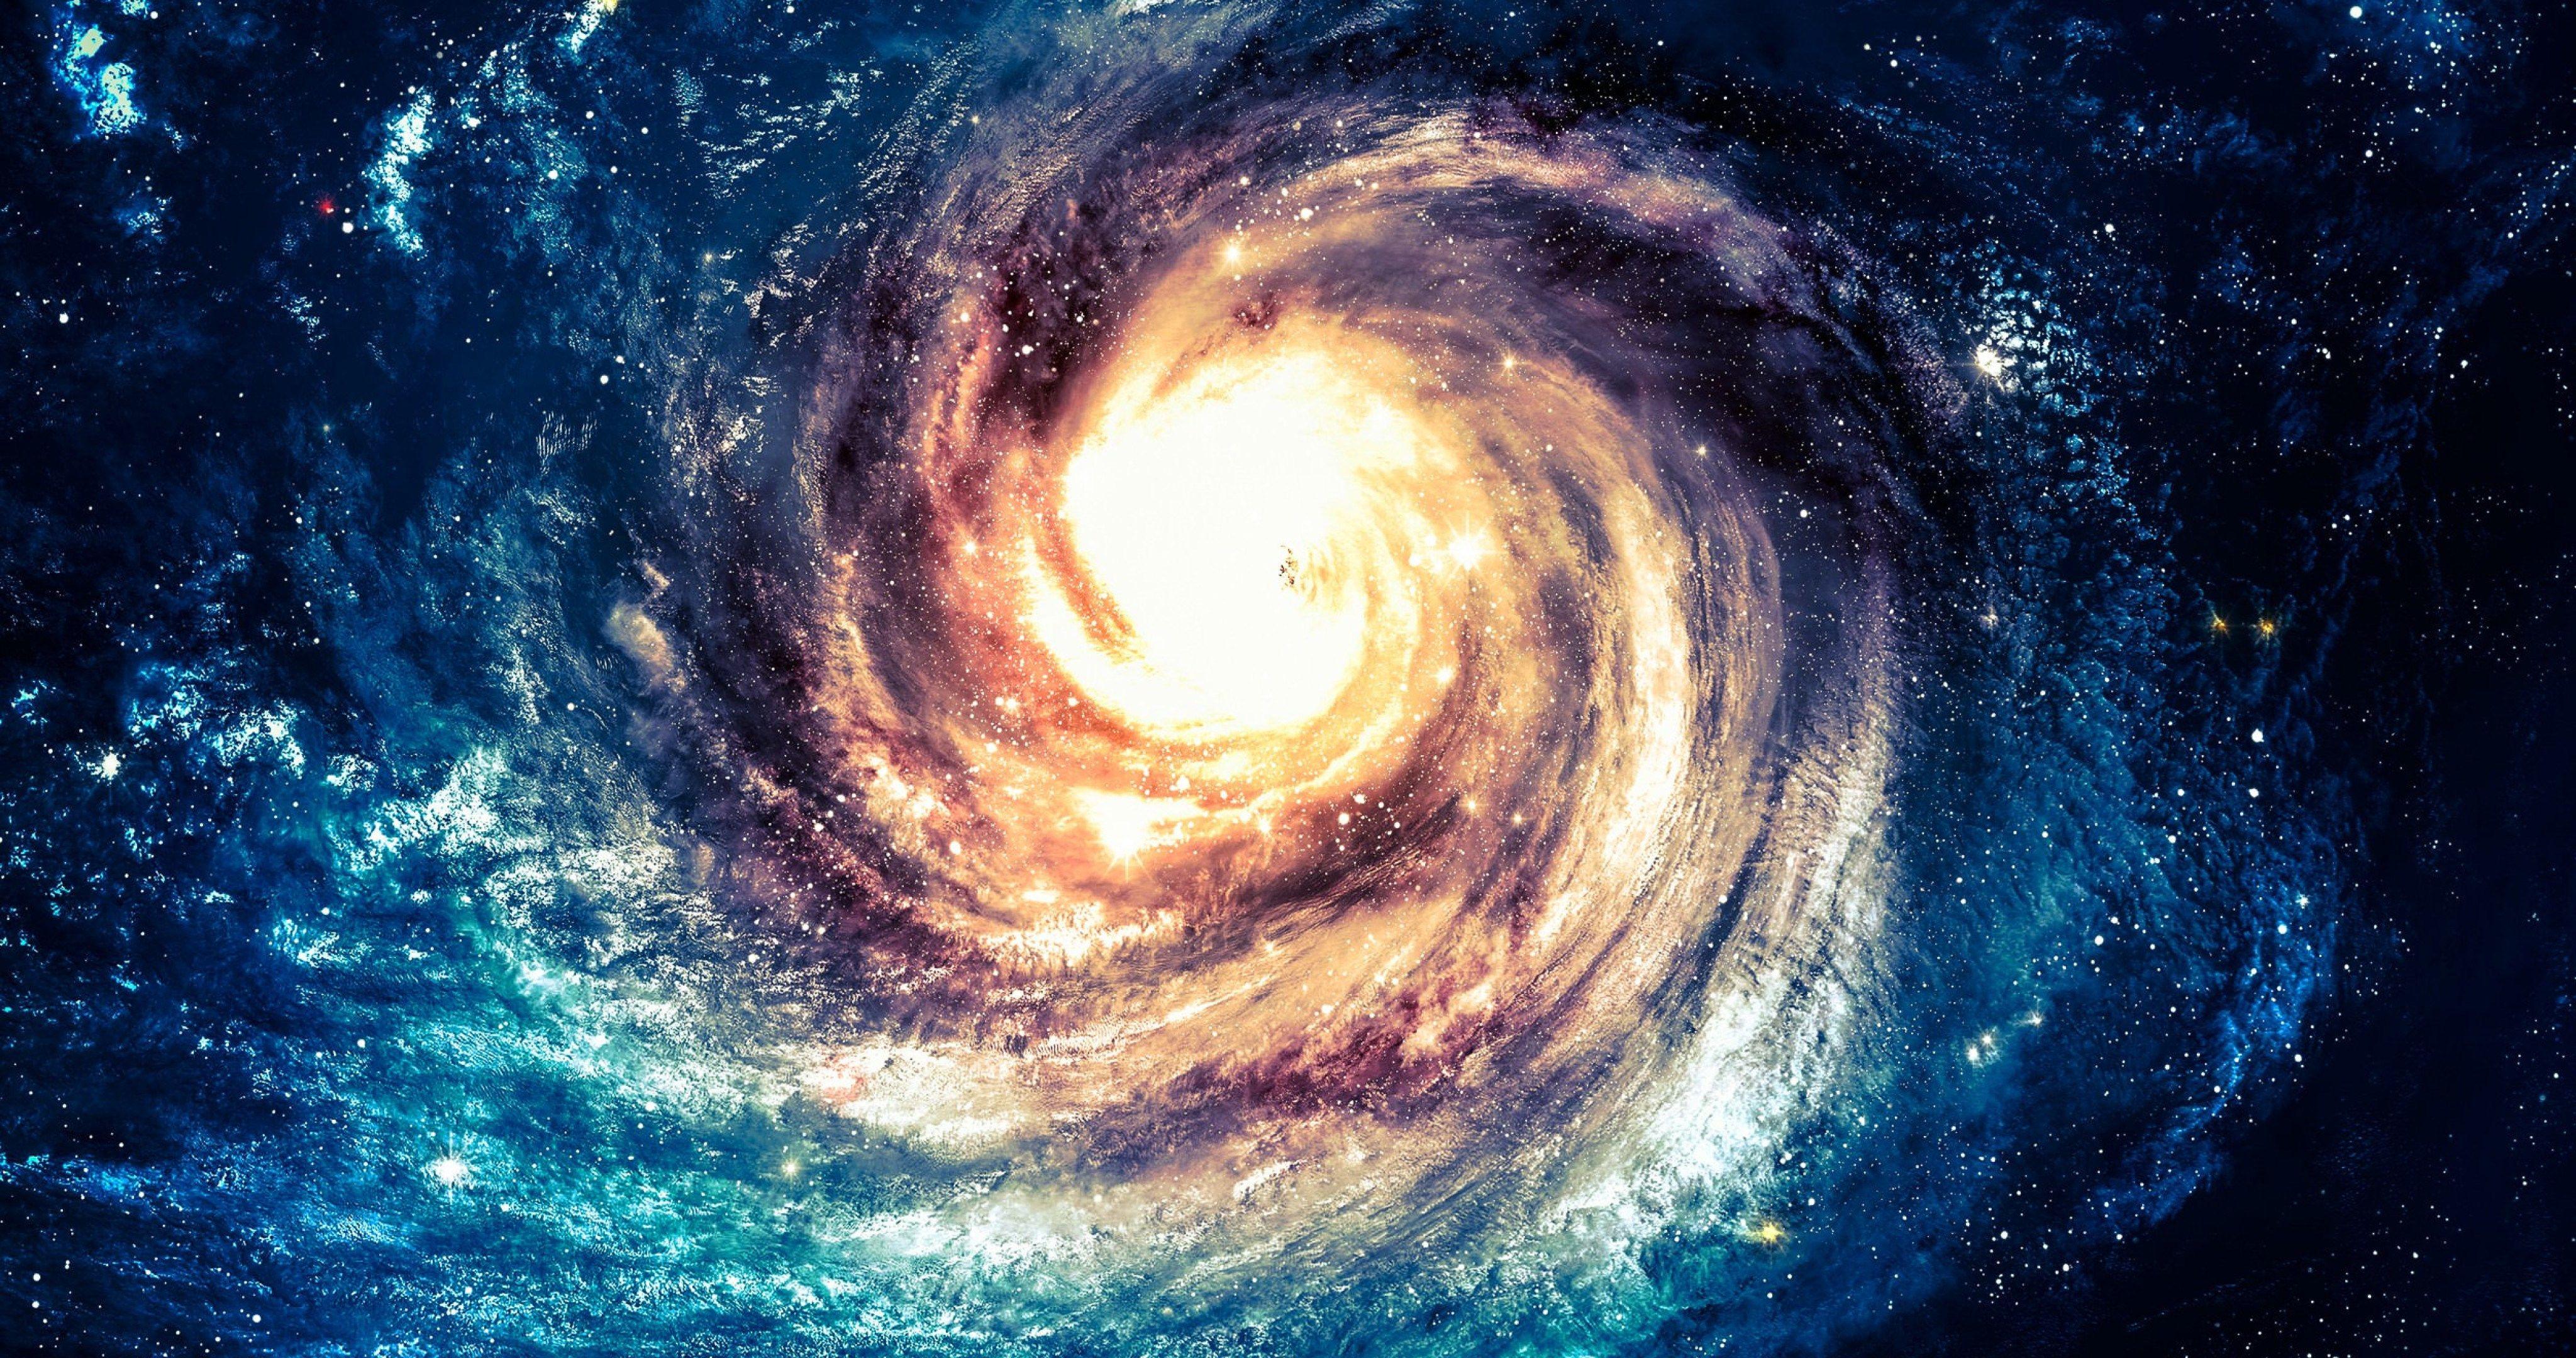 Universe Stars 4k Ultra Hd Wallpaper Space Stars Space Art Galaxy Wallpaper